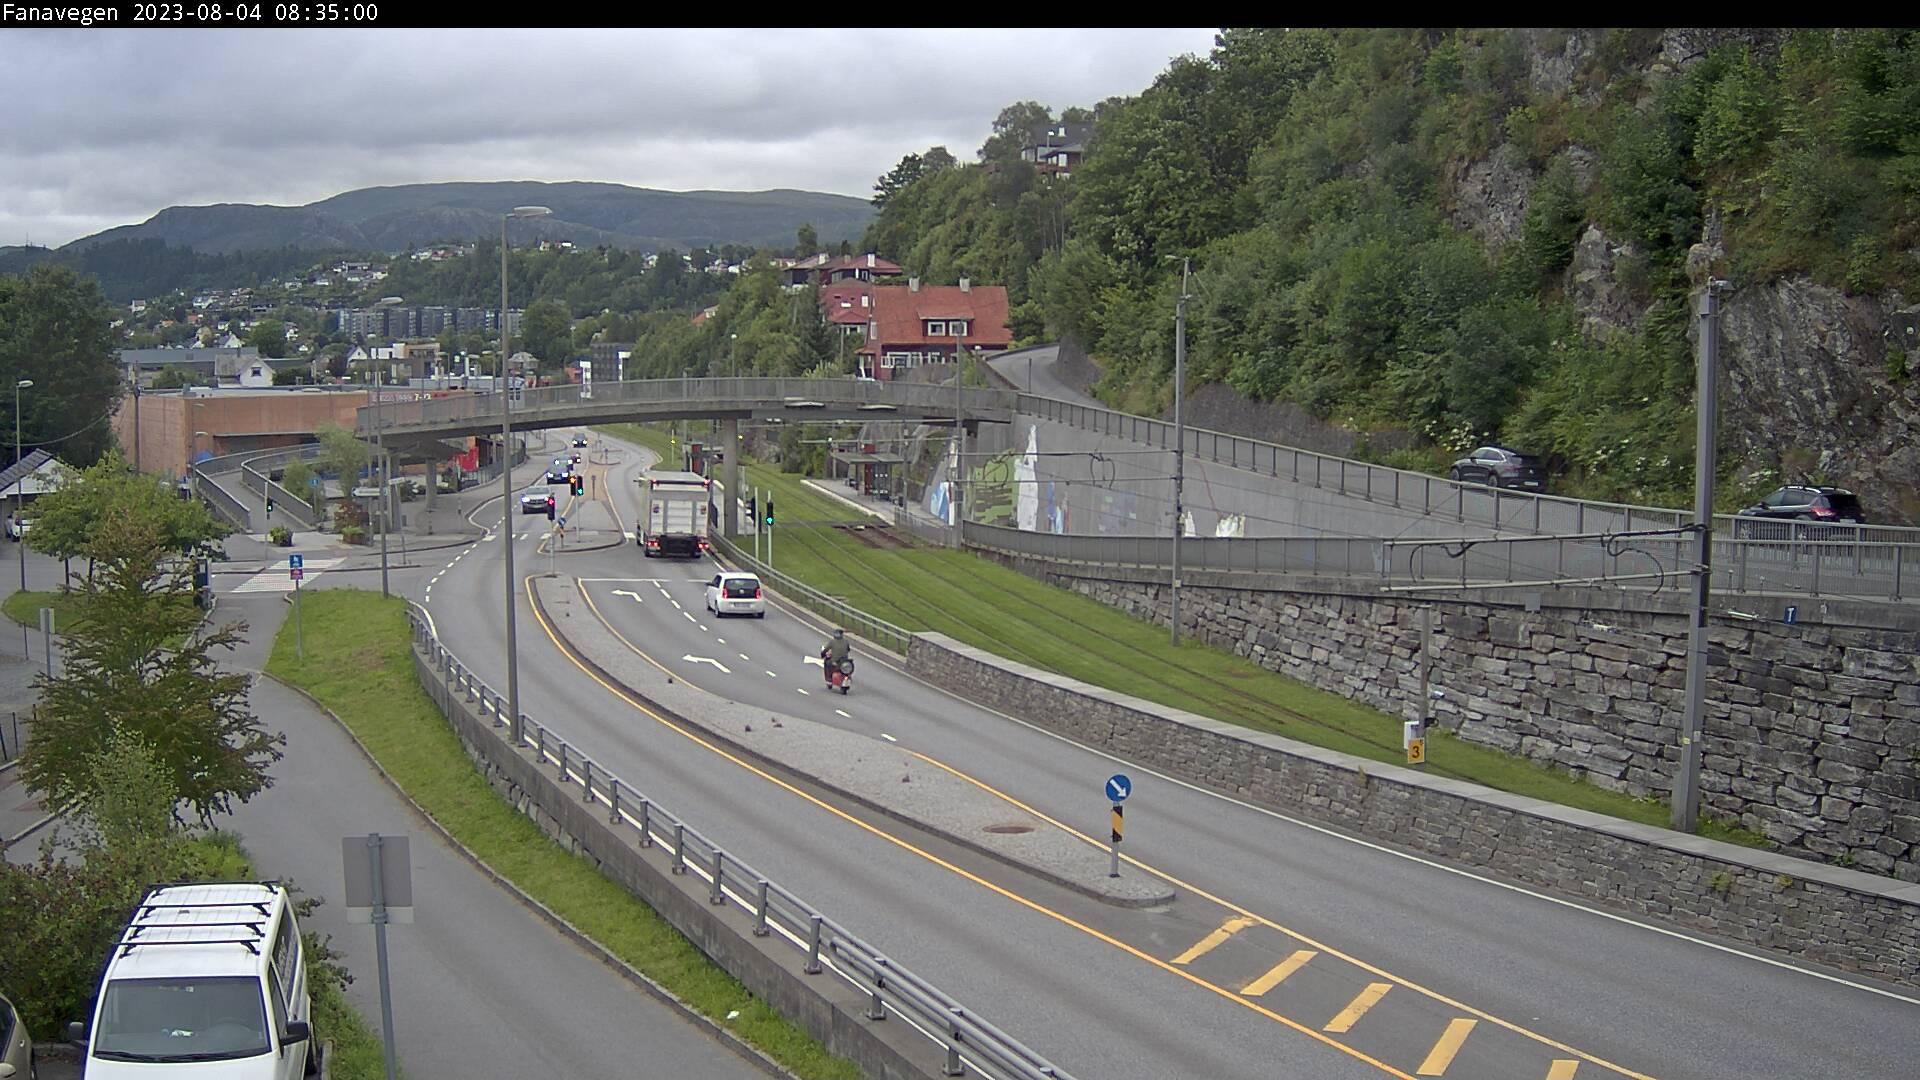 Webcam Nesttun, Bergen, Hordaland, Norwegen